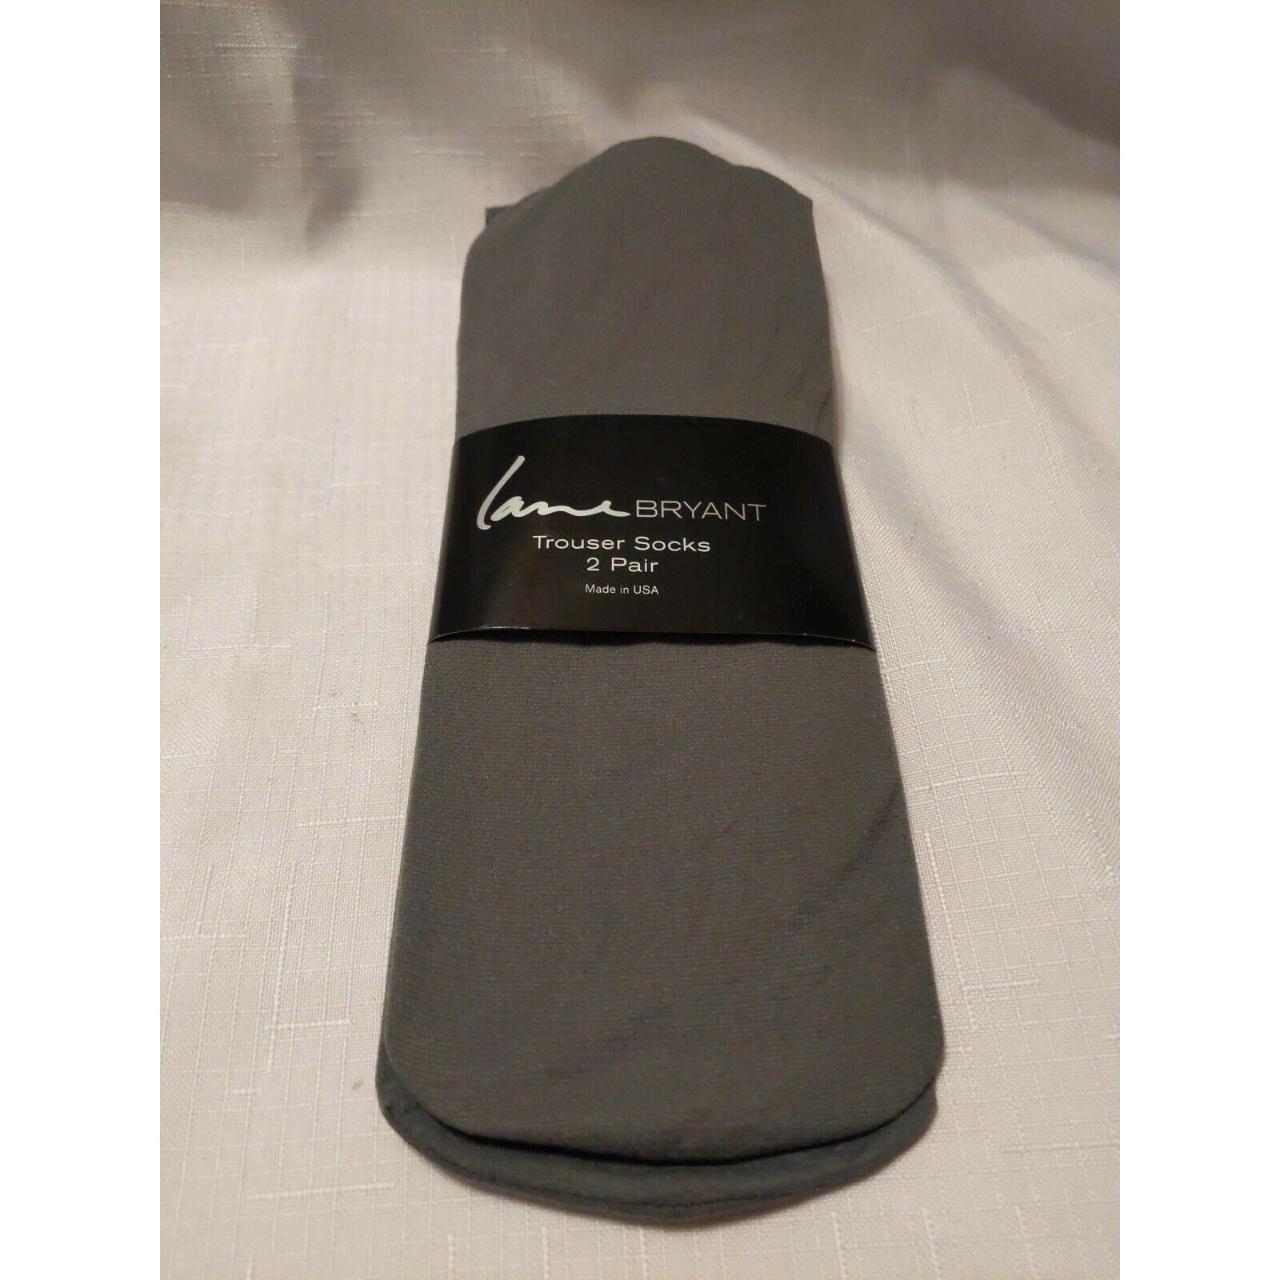 Product Image 1 - Lane Bryant Trouser socks -